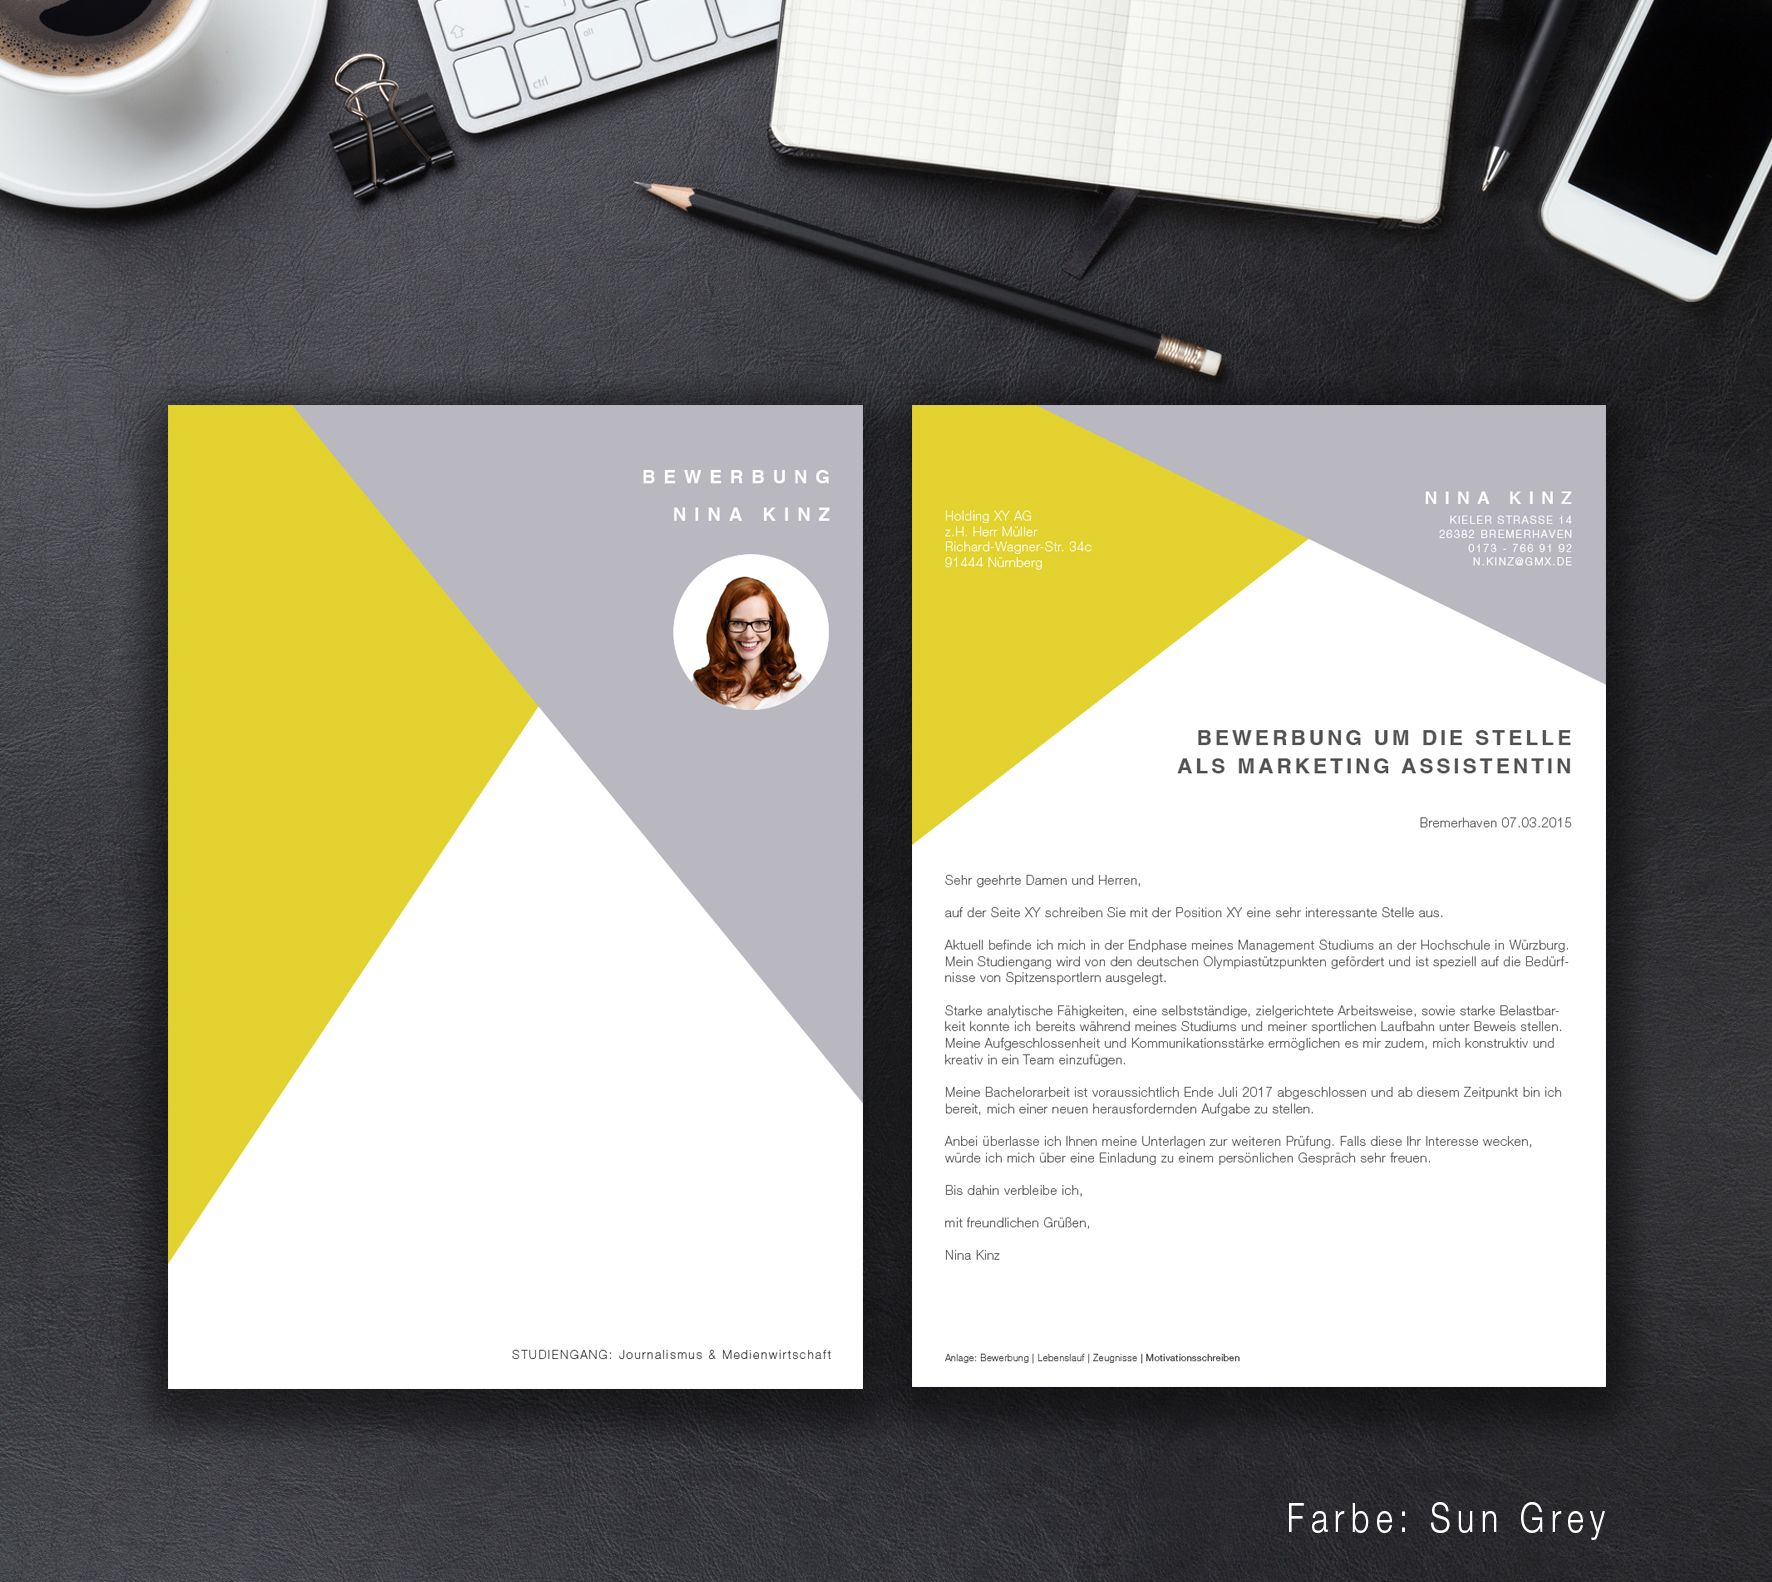 Kreativ Art | Printdesign | Pinterest | Layouts, Typo and Logos